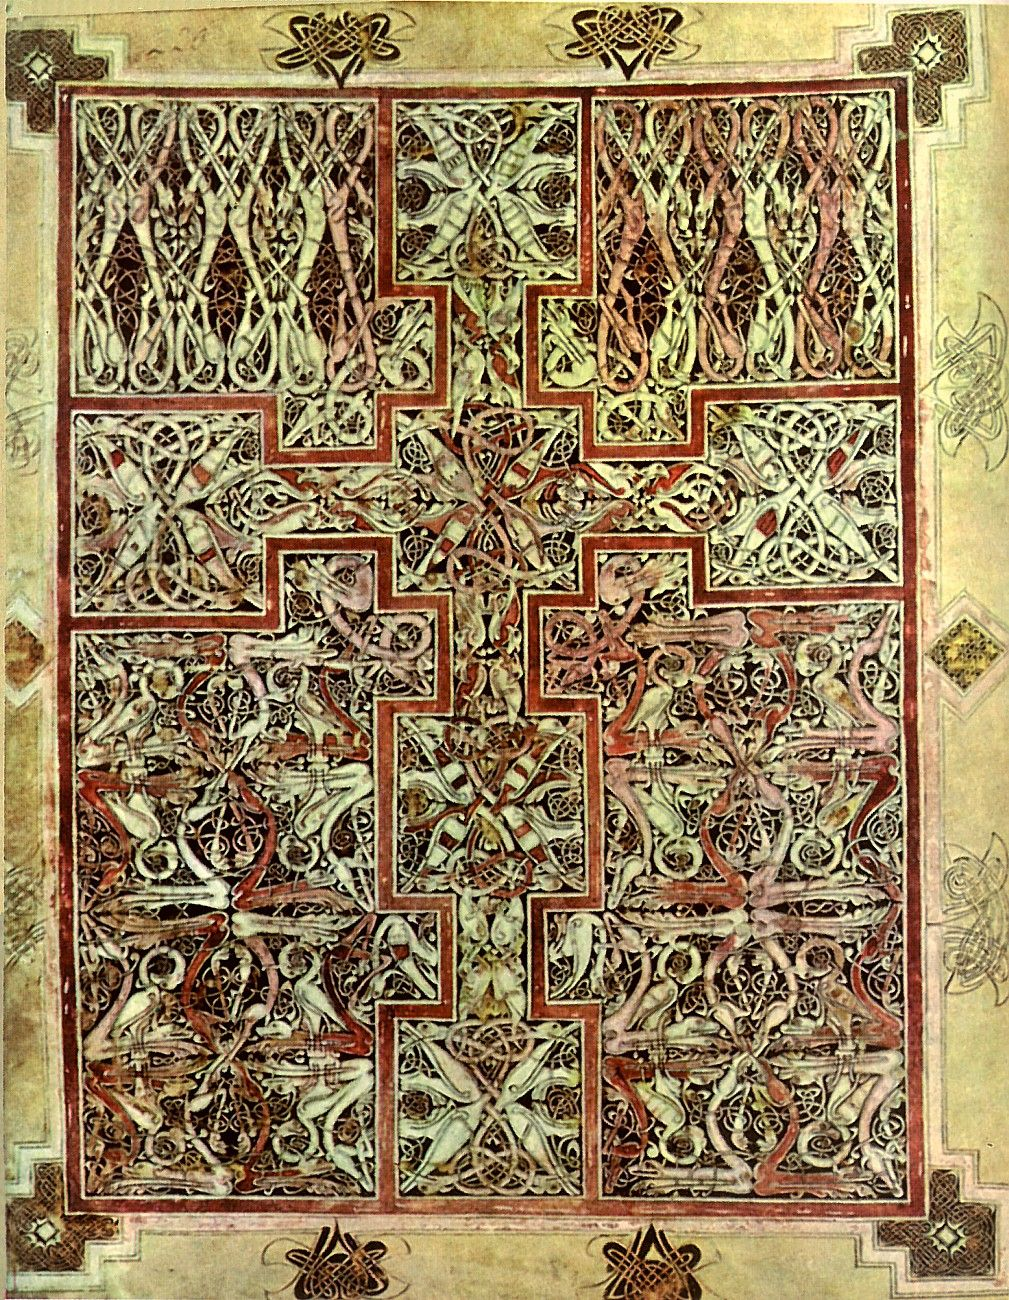 St Luke S Gospel Carpet Page Only Surviving One